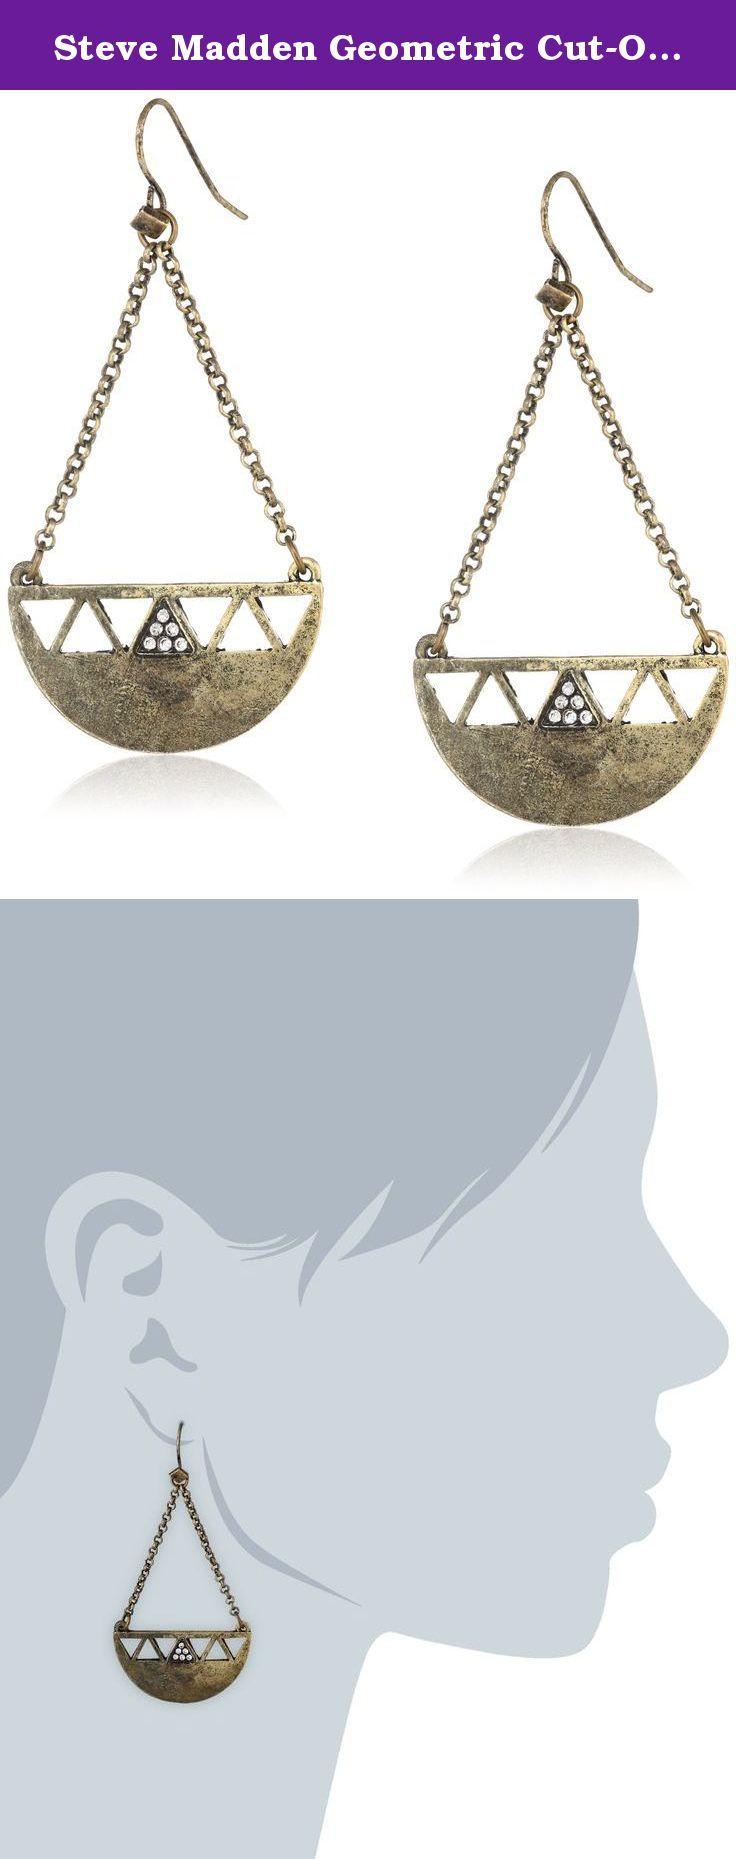 Steve madden geometric cut out chandelier drop earrings 25 steve madden geometric cut out chandelier drop earrings 25 steve madden presents arubaitofo Choice Image